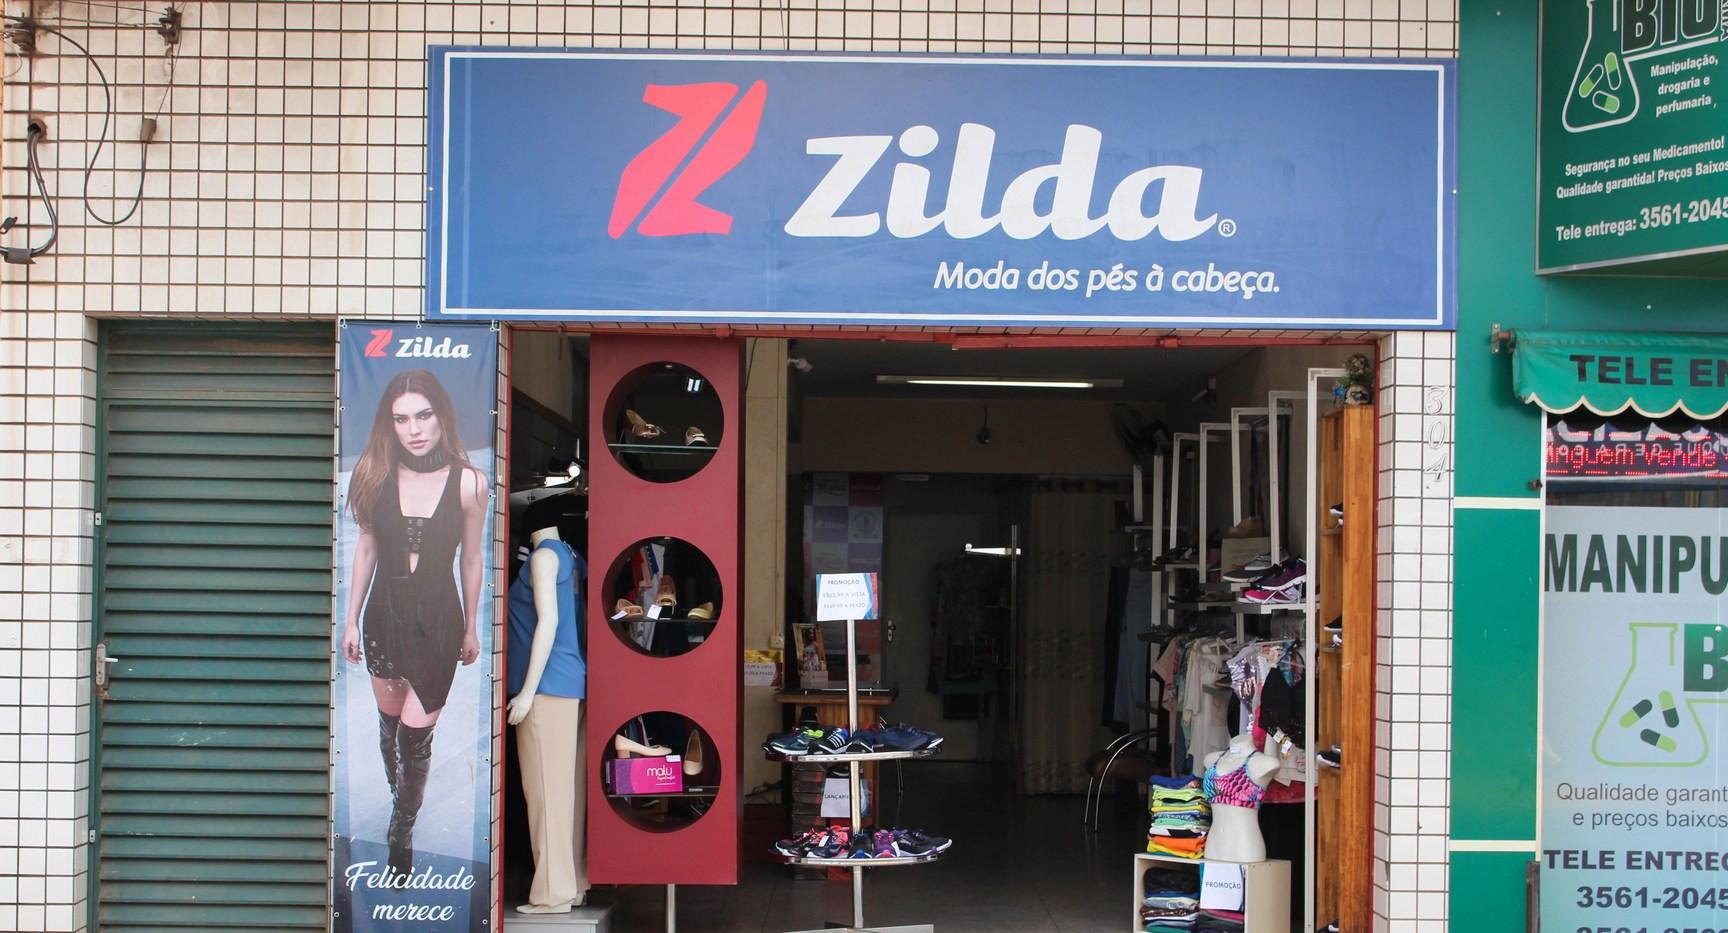 Zilda Queiroz